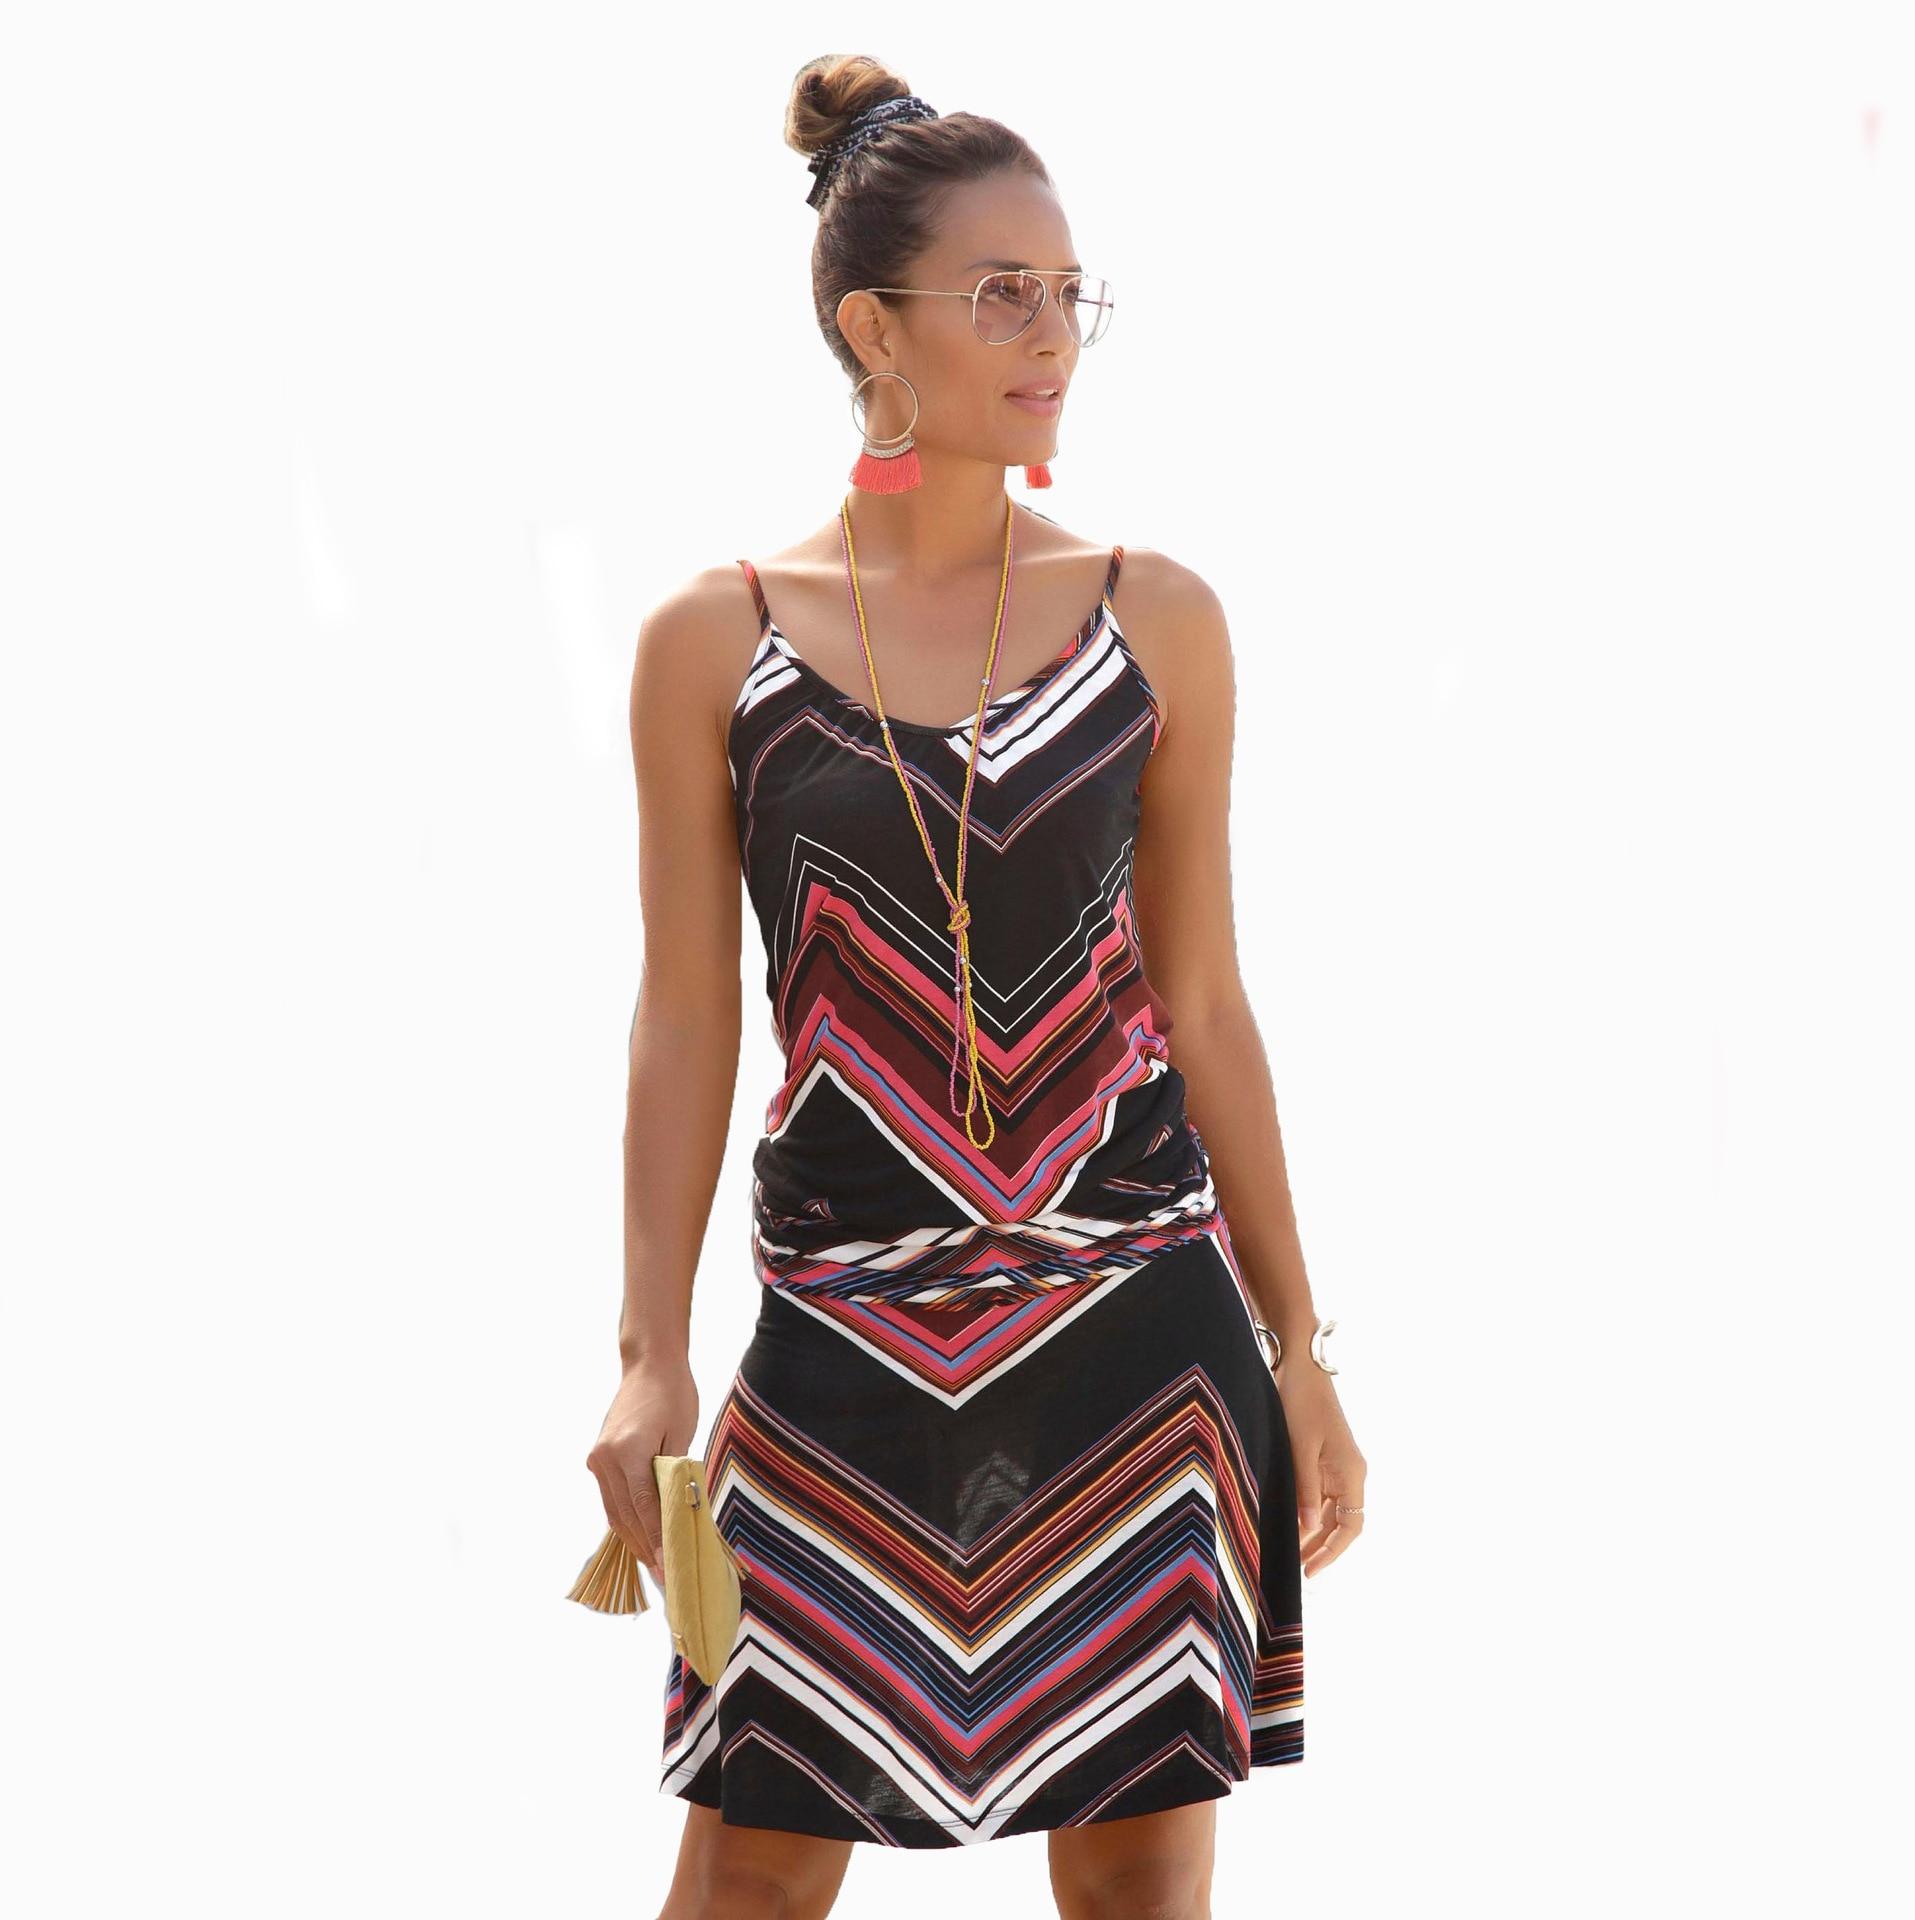 HOUZHOU Women Summer Loose Printed Straps Dress Casual Sleeveless Bandage Sexy Female Short Dress Plus Size Dresses Beach Style 7